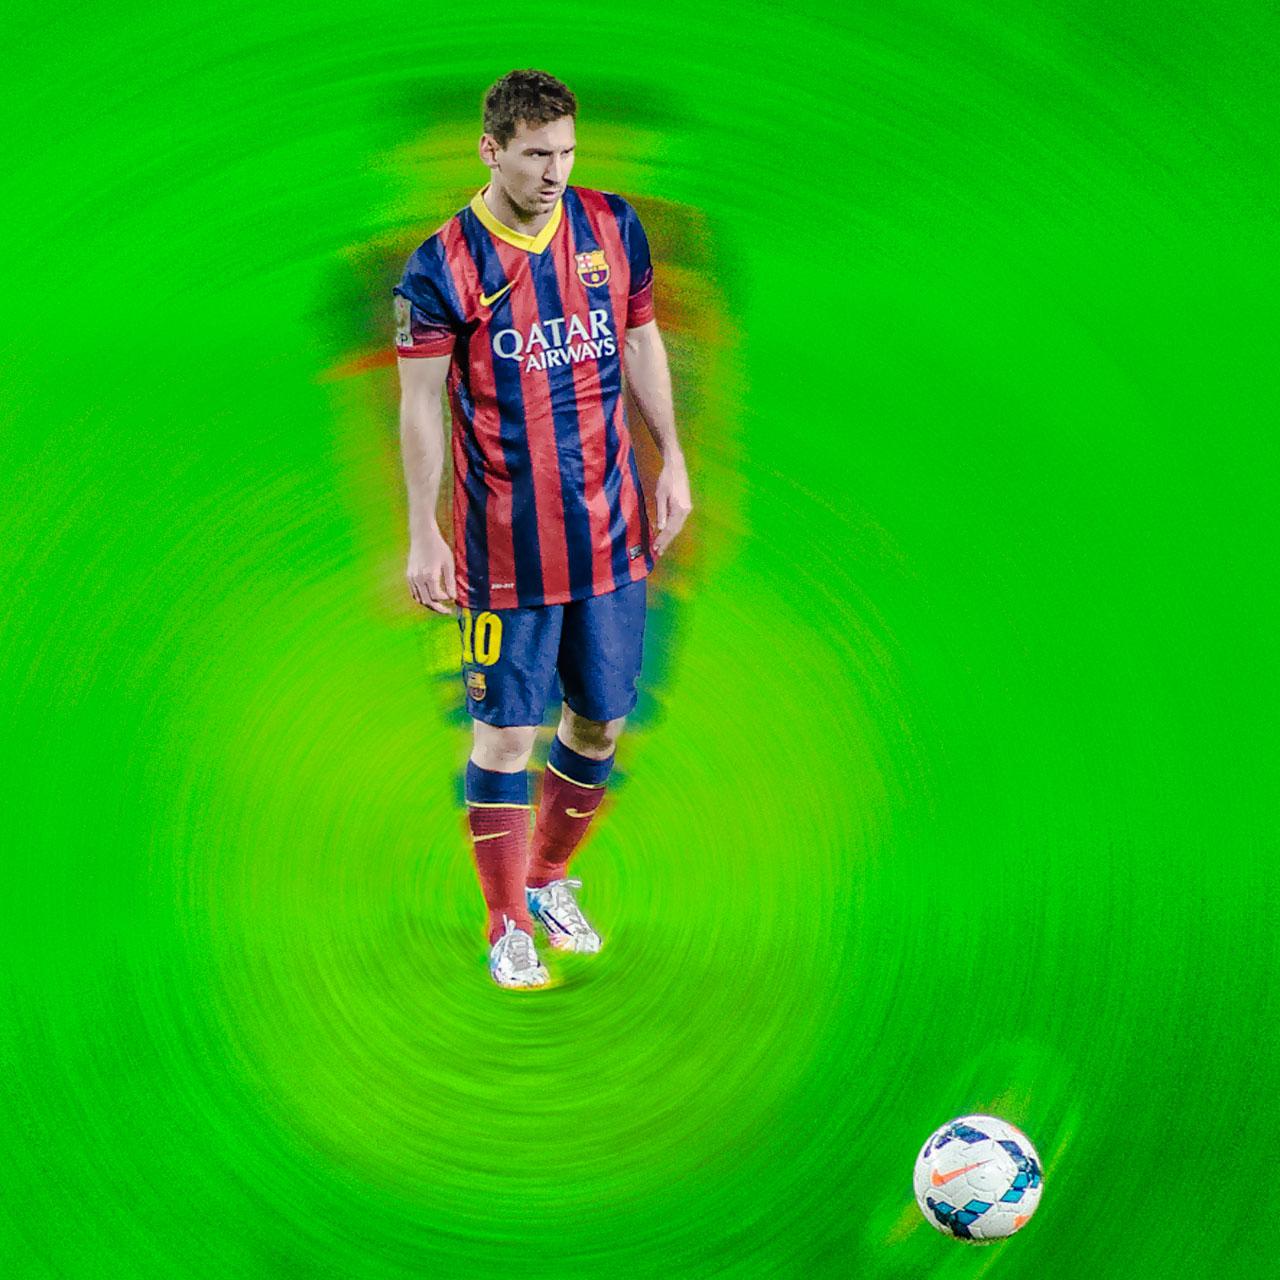 Lionel Messi's goal vs Athletic Bilbao tops years best soccer vines